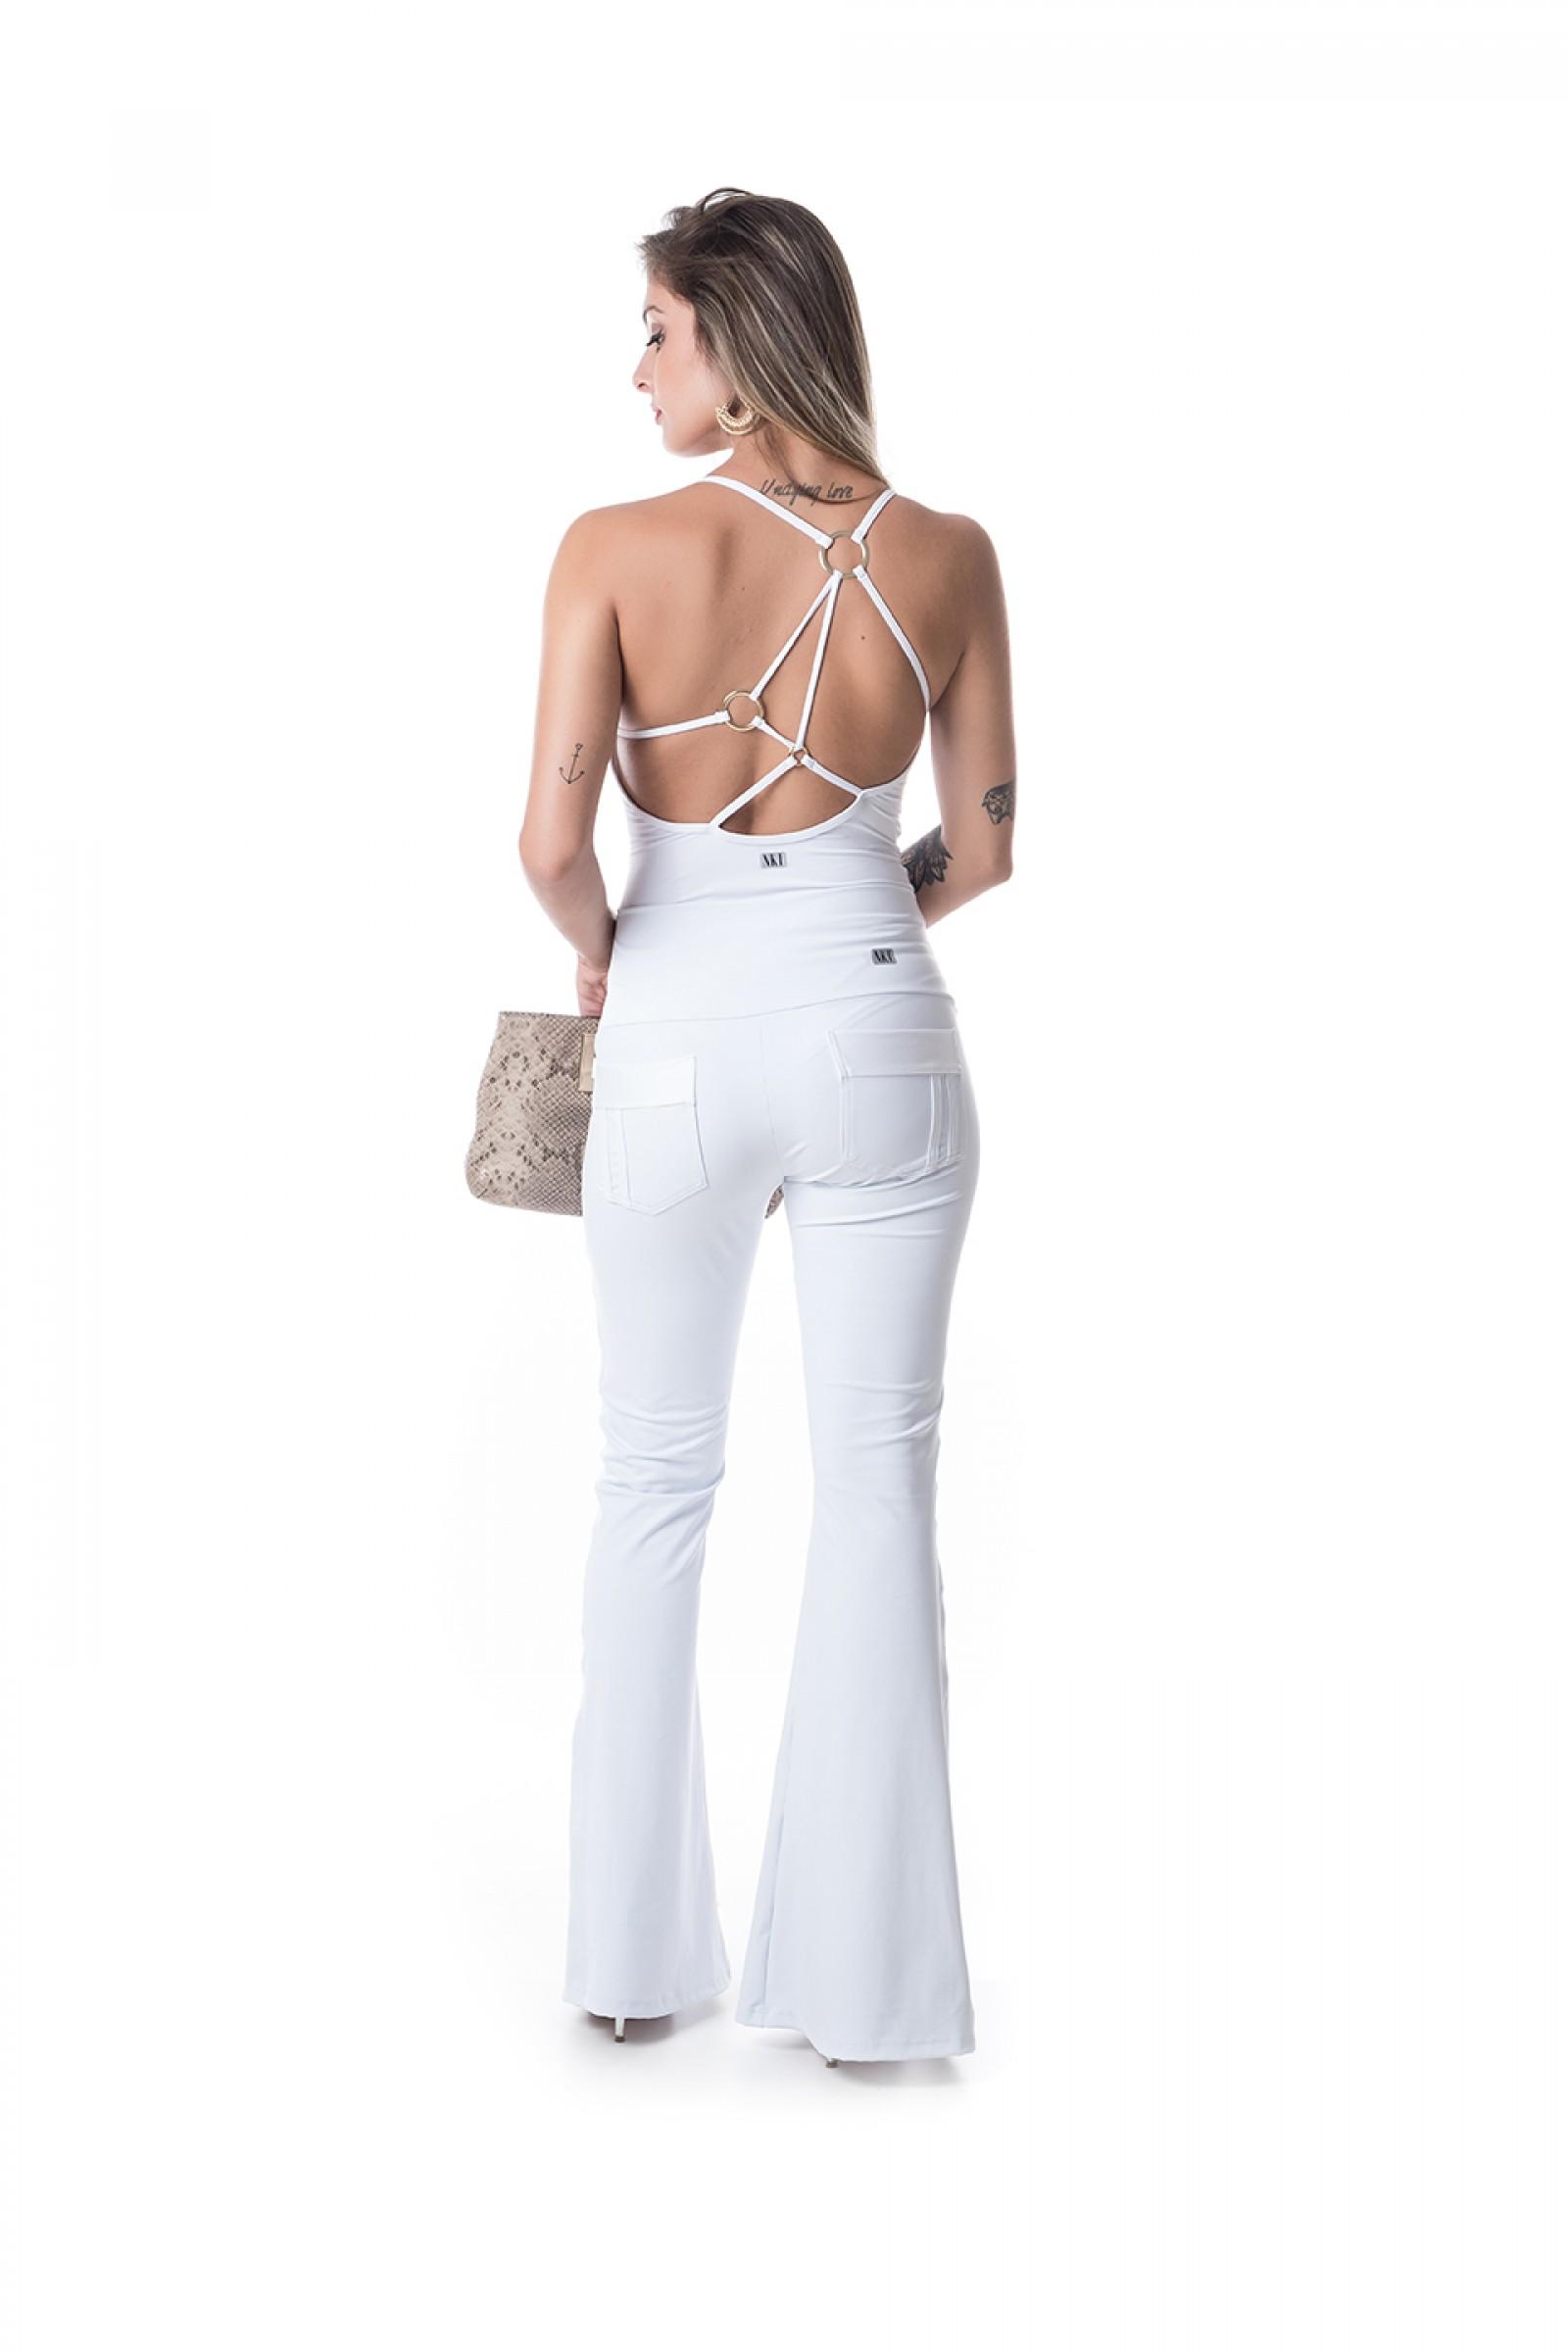 Body Challenge Branco, Coleção Challenge - NKT Fitwear Moda Fitness